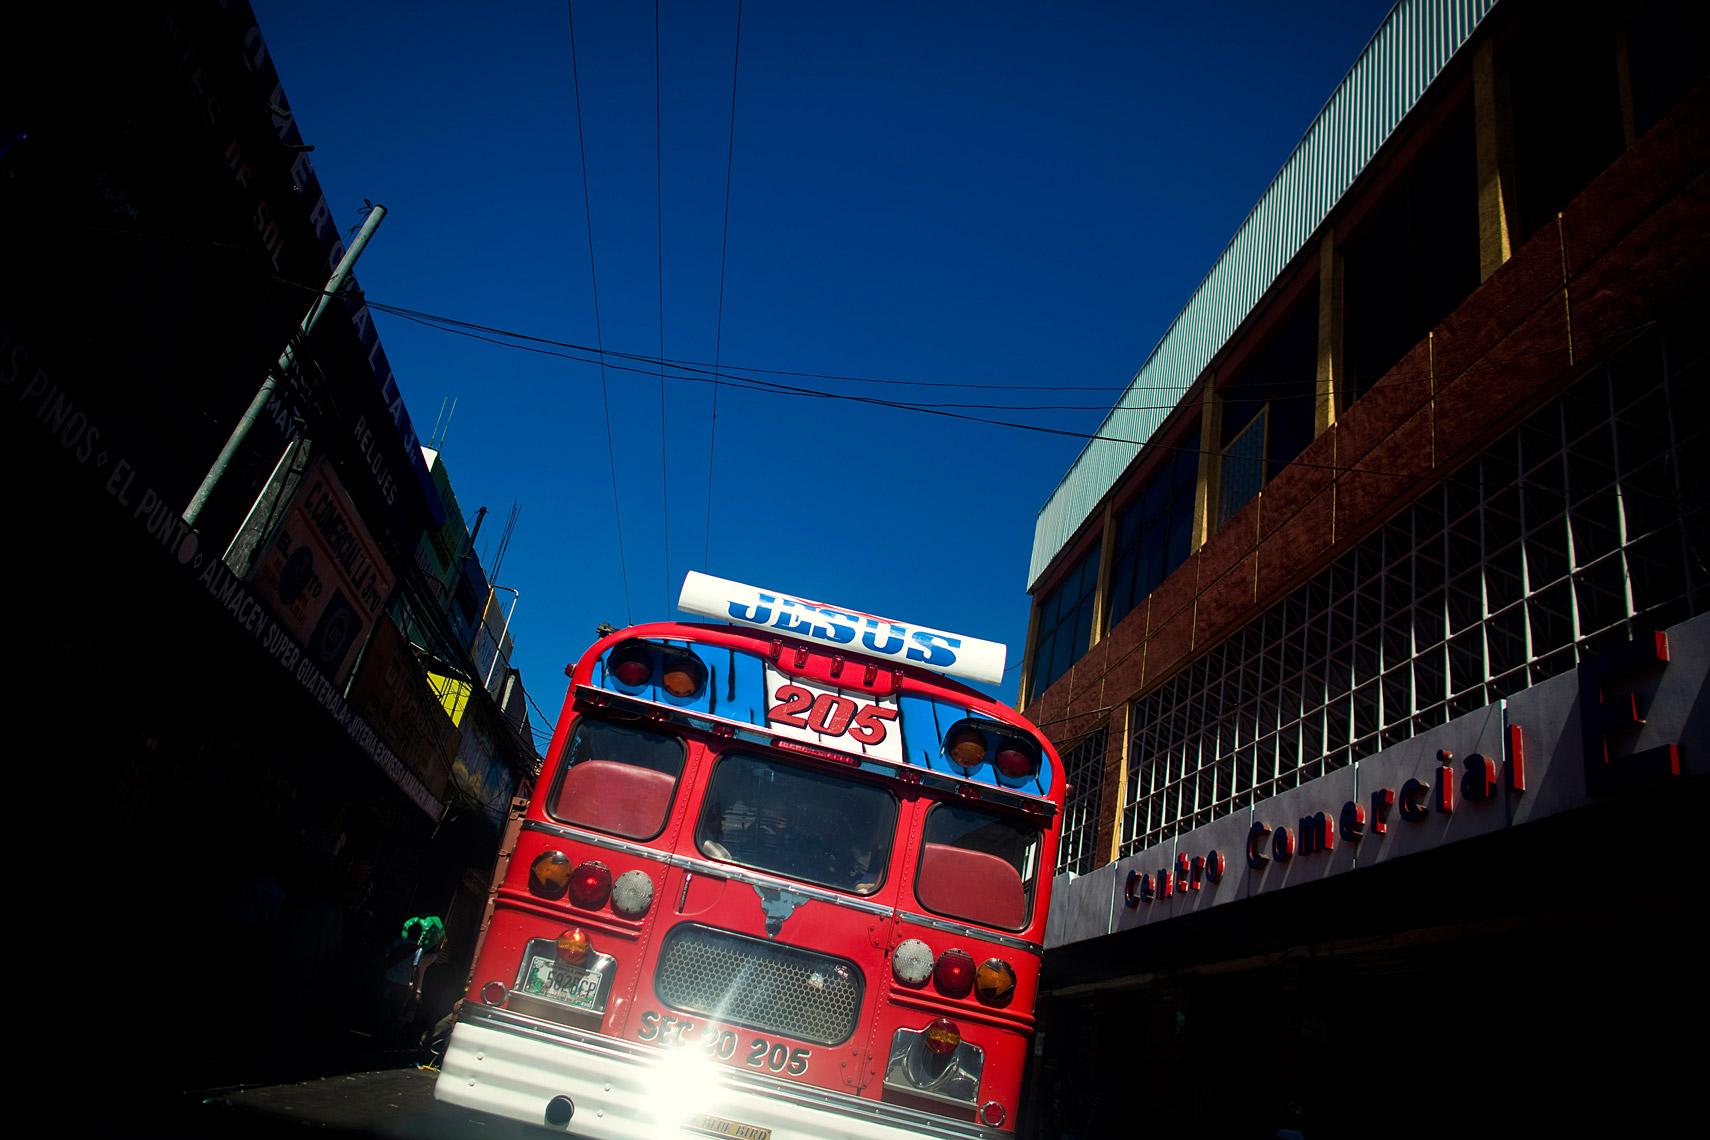 bus025.jpg